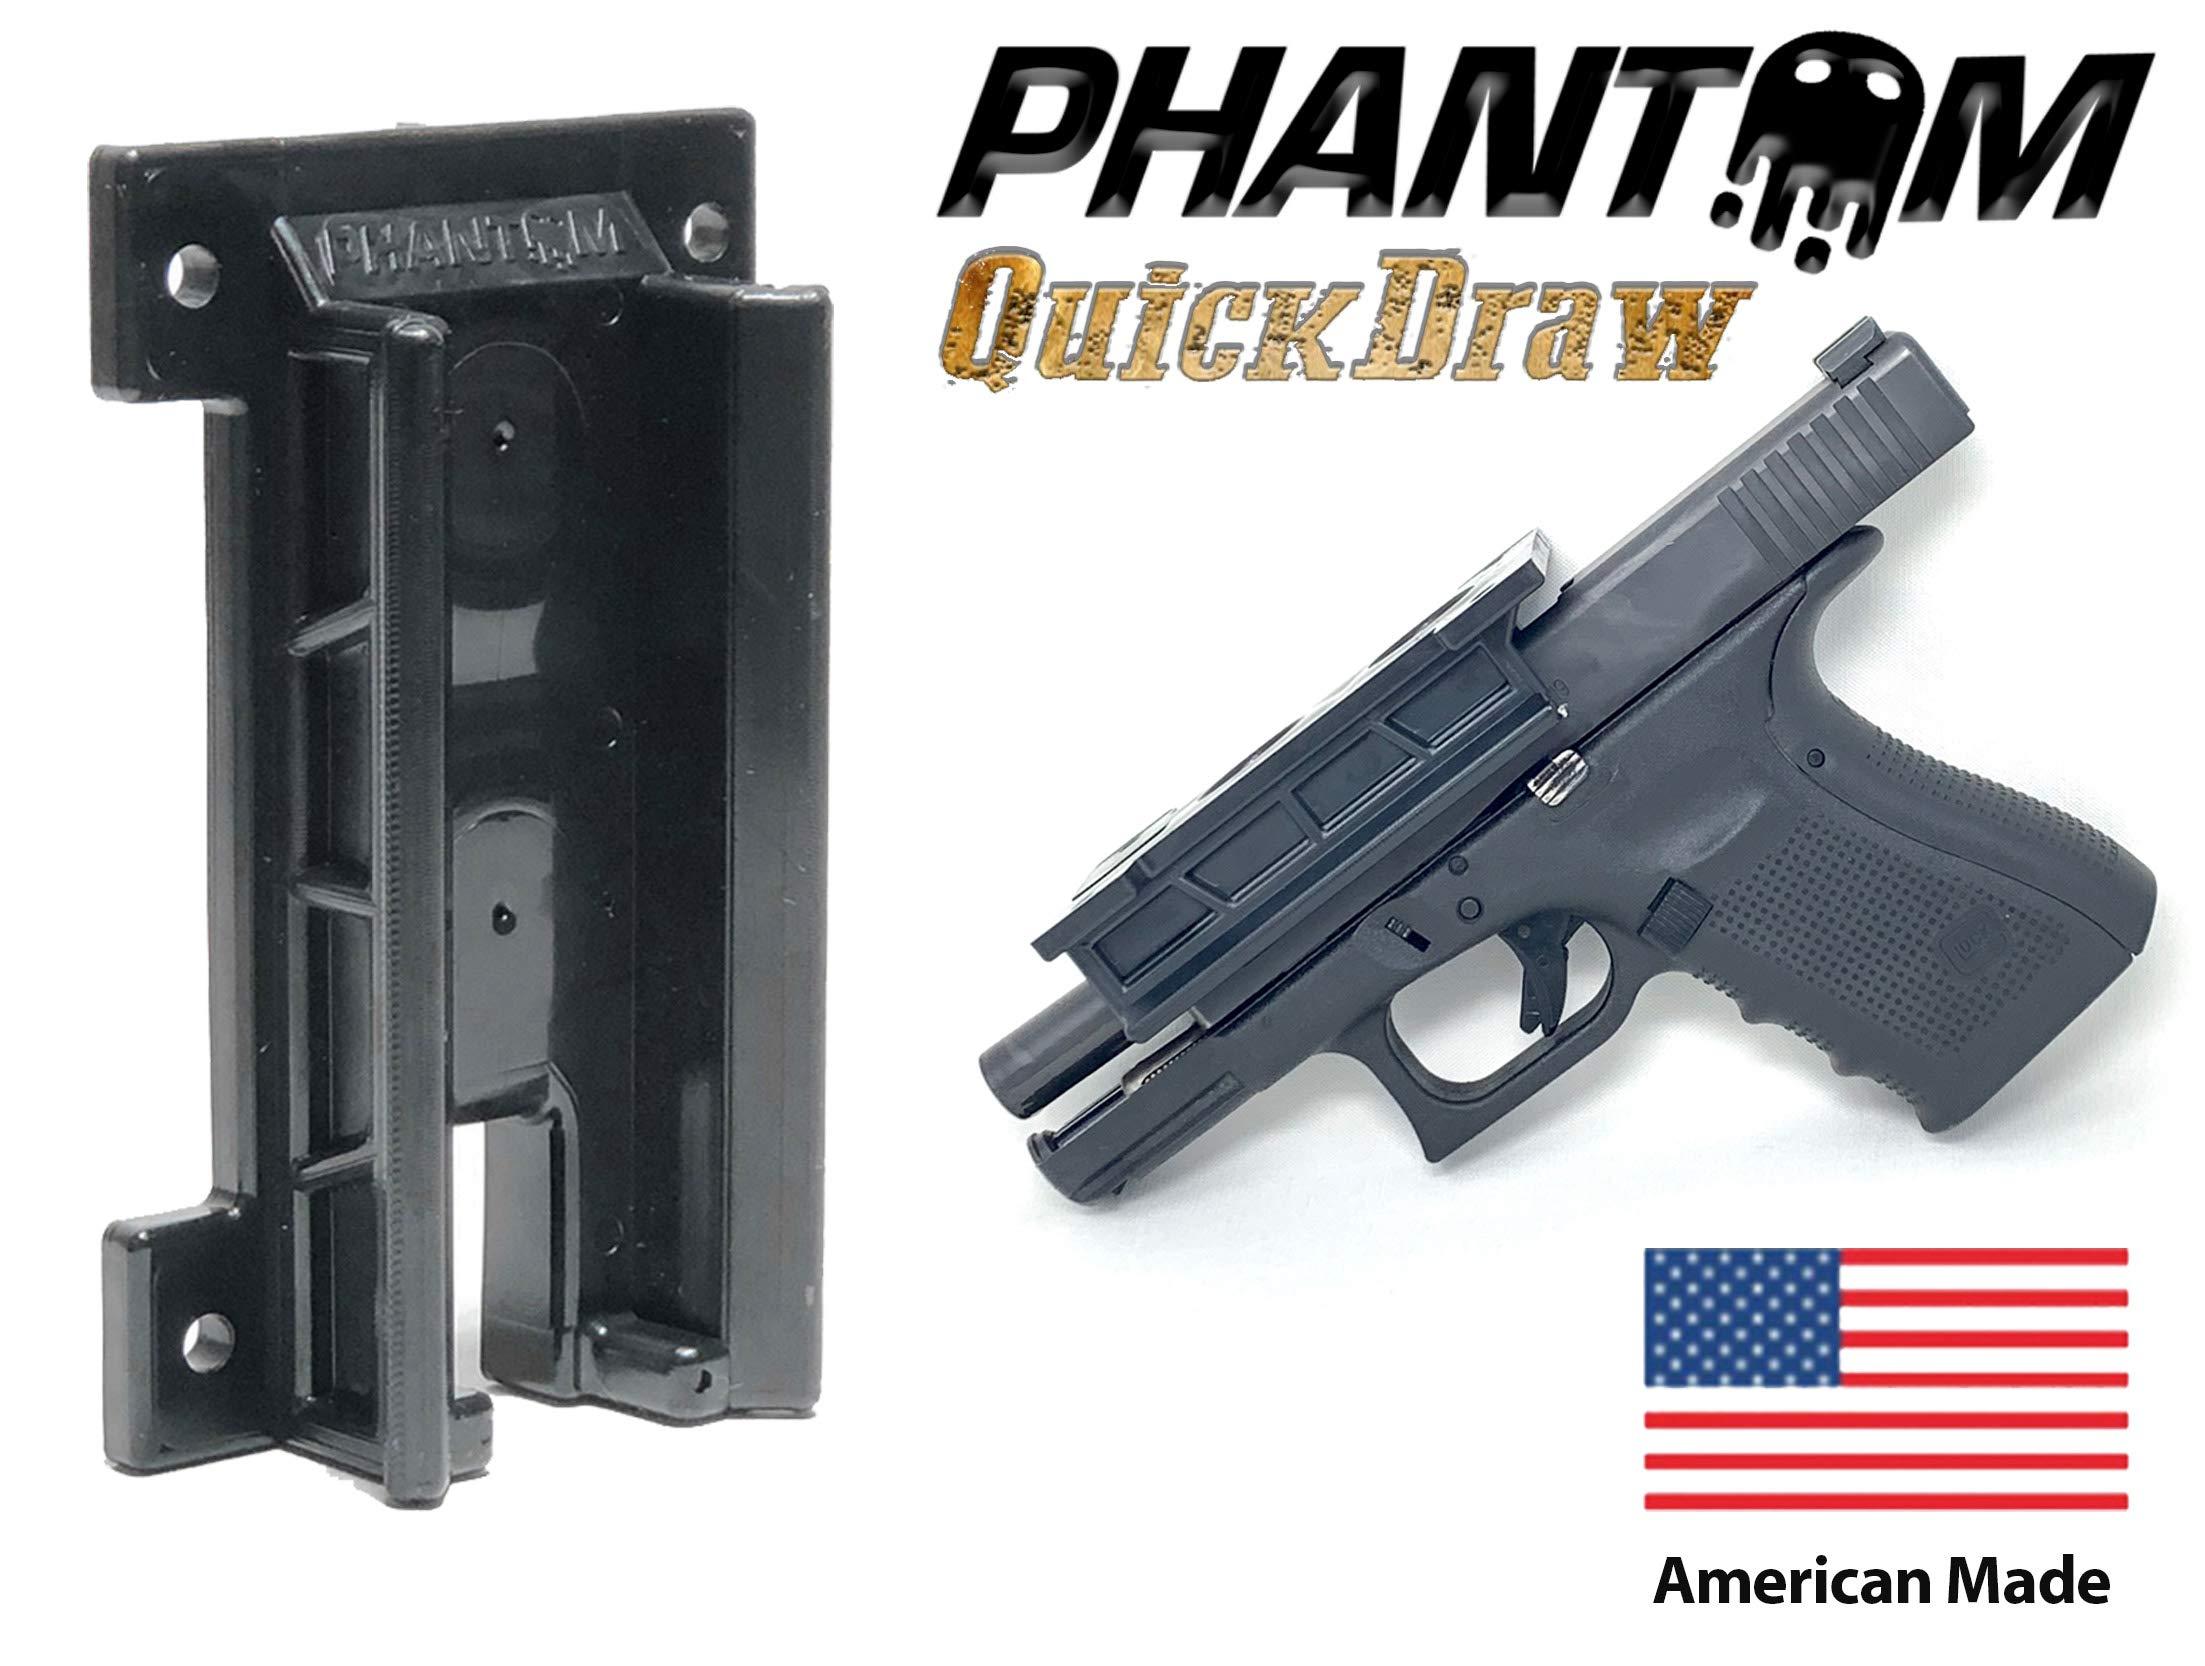 Phantom Quickdraw - Magnetic Gun Mount & Holster - Concealed Tactical Firearm & Gun Magnetic Holder for Truck, Car, Vehicle, Handgun, Pistol - Patent Pending, American Made, Veteran Owned by Phantom